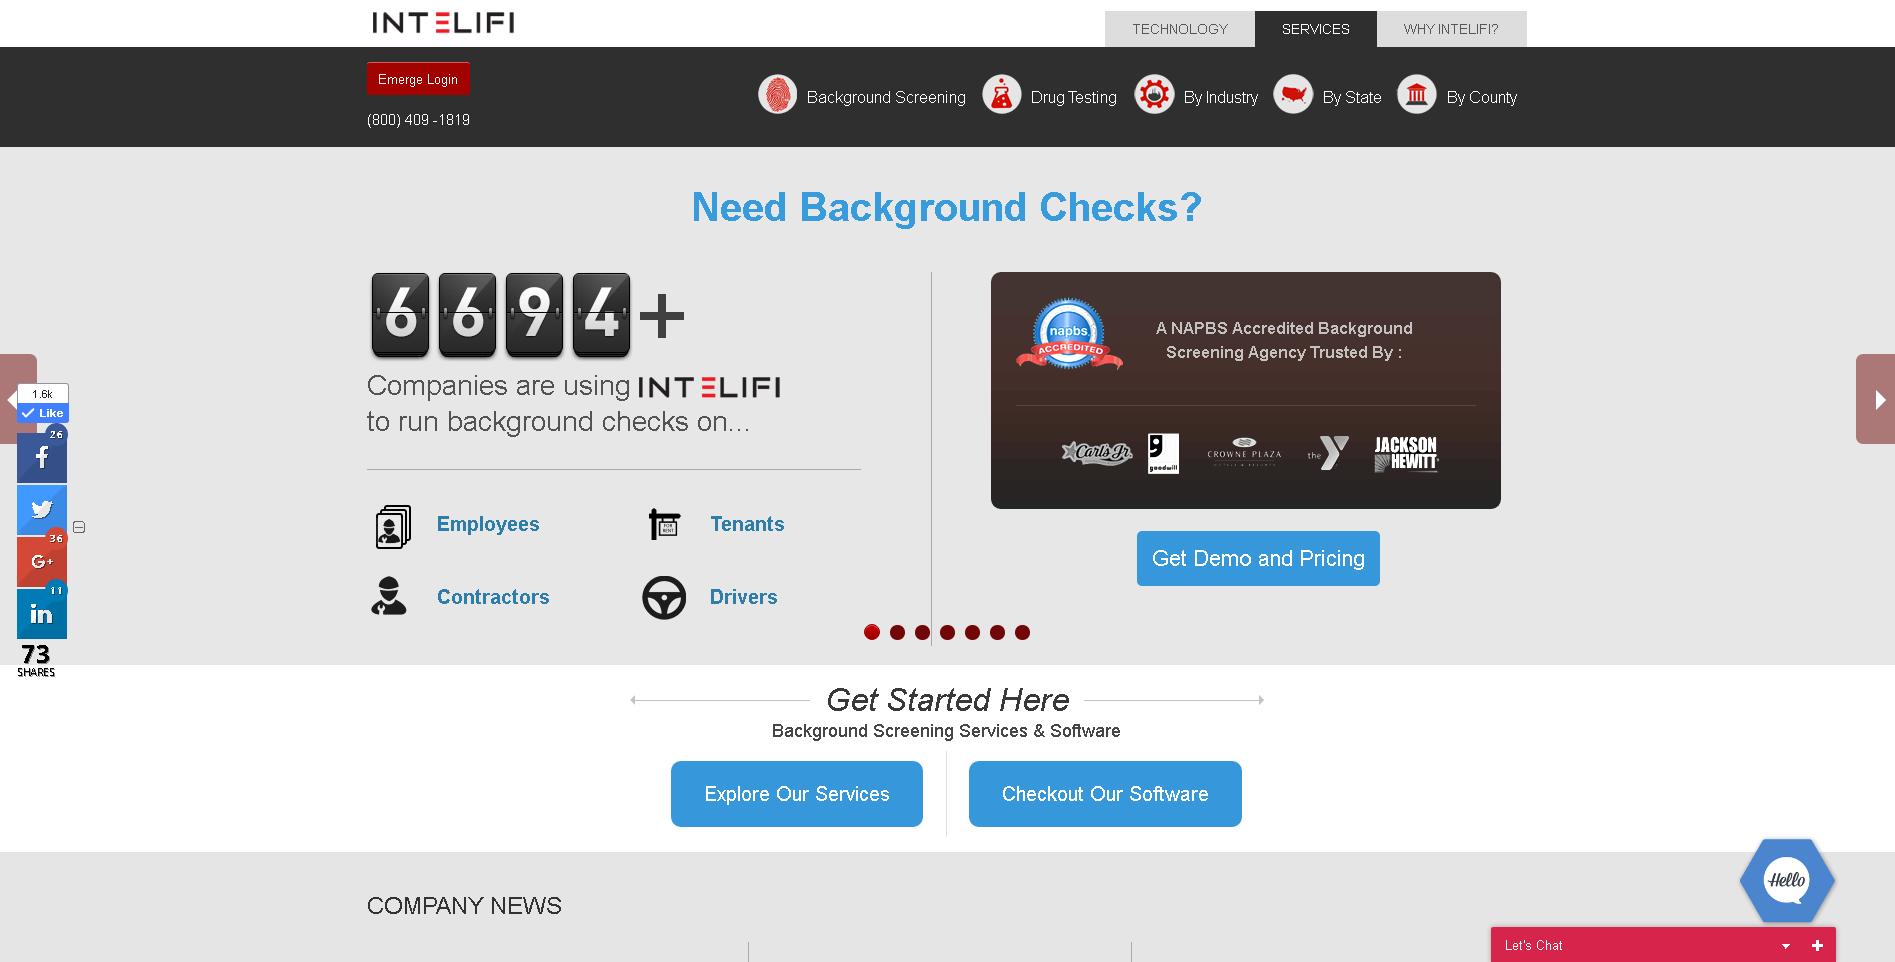 Emerge screenshot: employment background checks by Intelifi